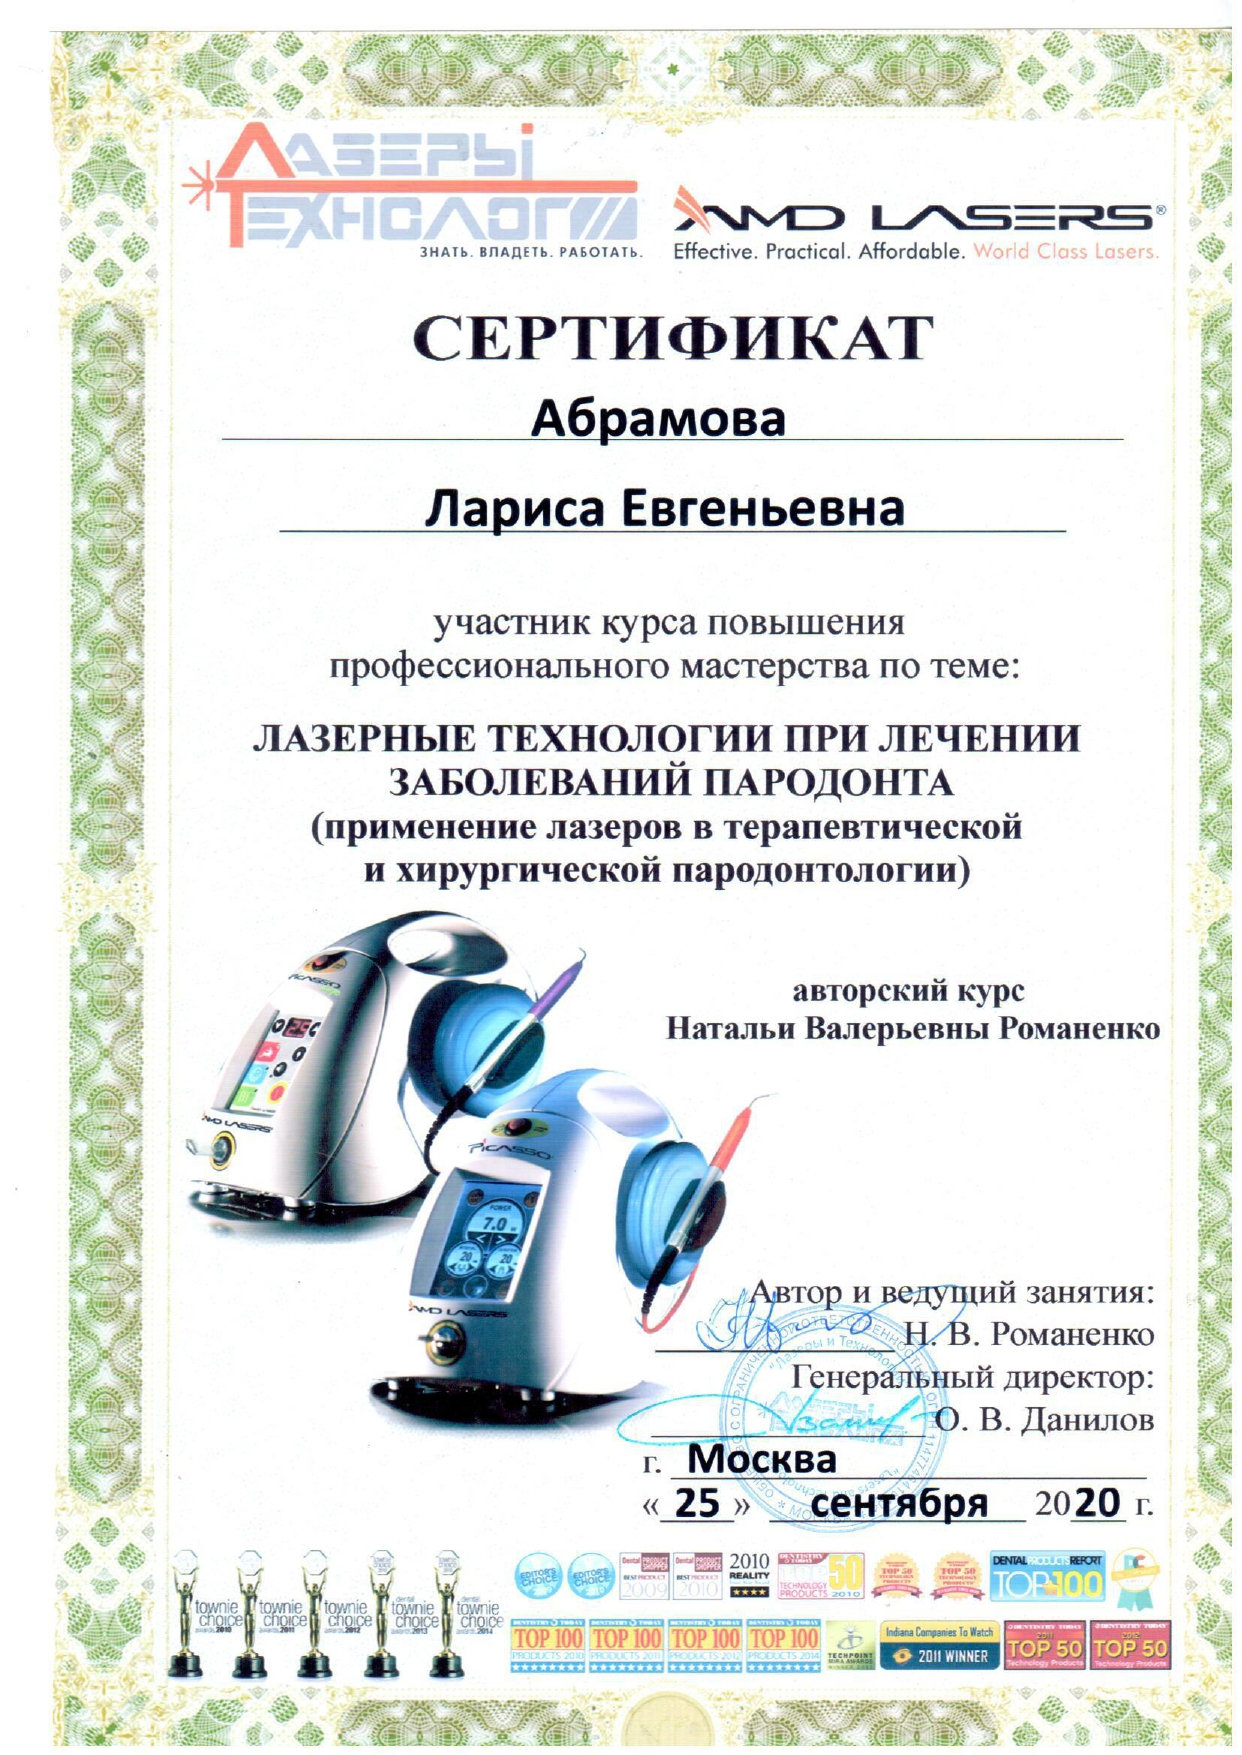 Абрамова Лариса Евгеньевна - Сертификат_04